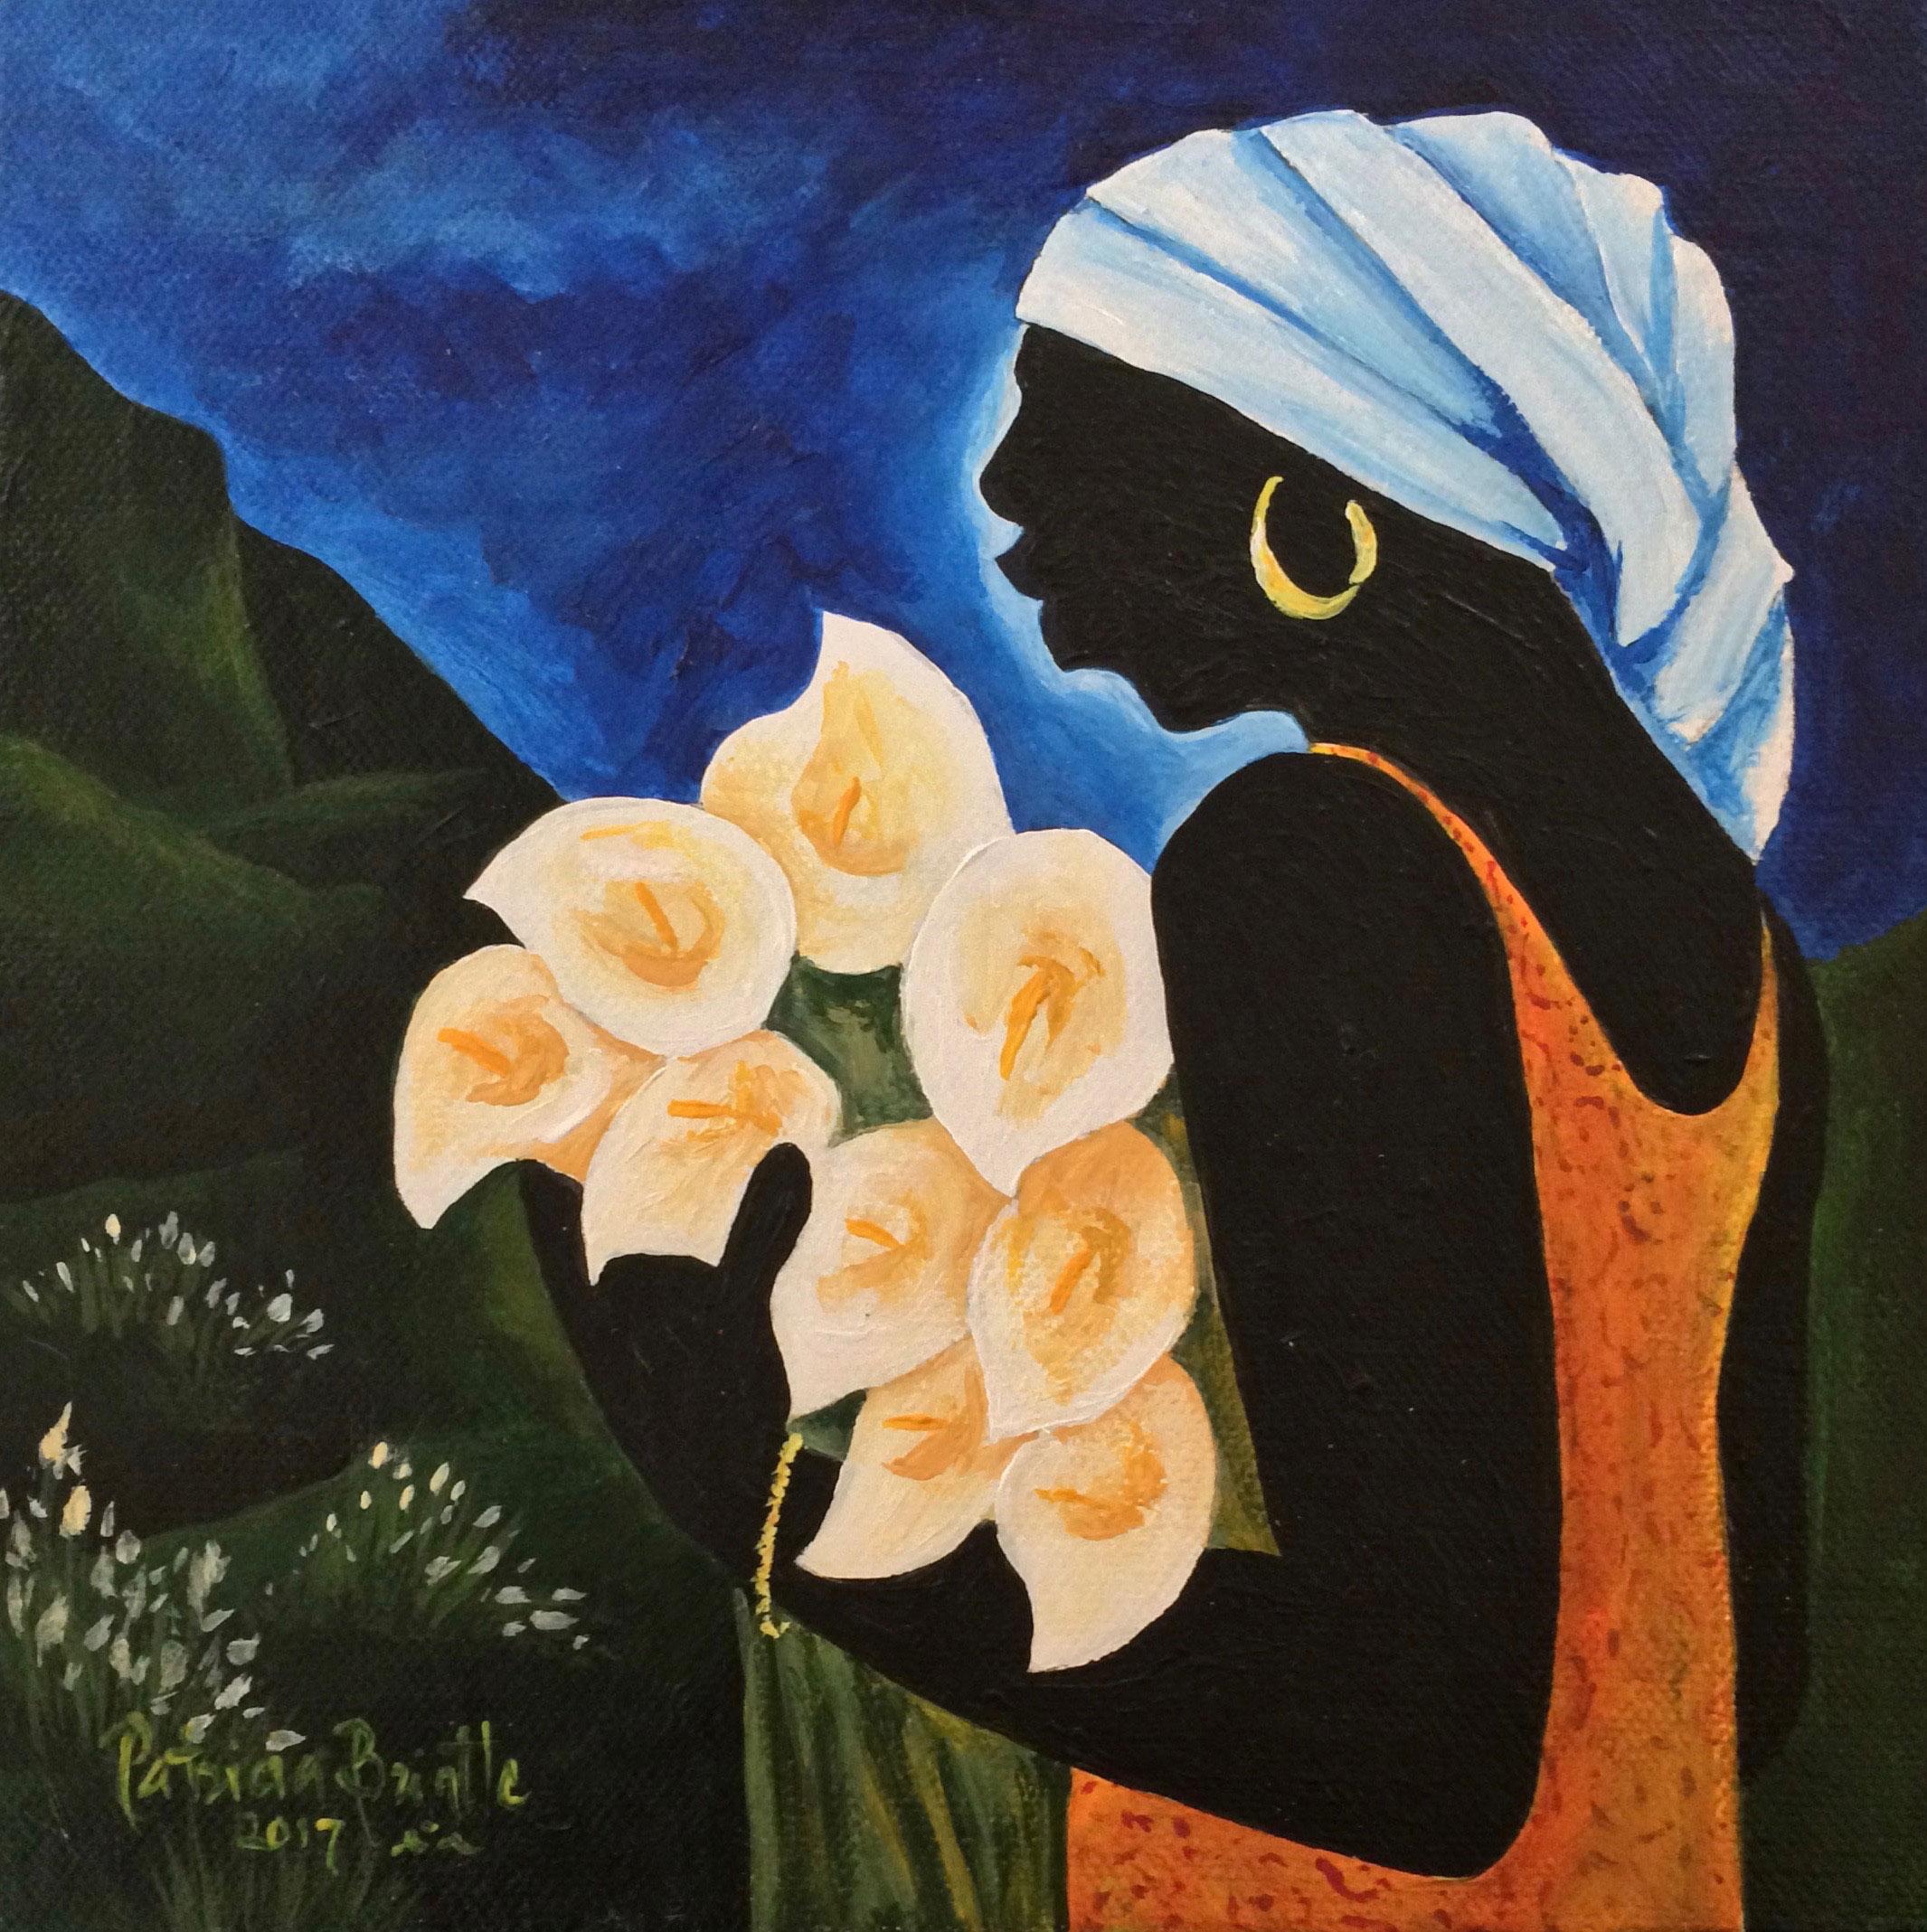 Rosalie Mae 8x8 by Patricia Brintle